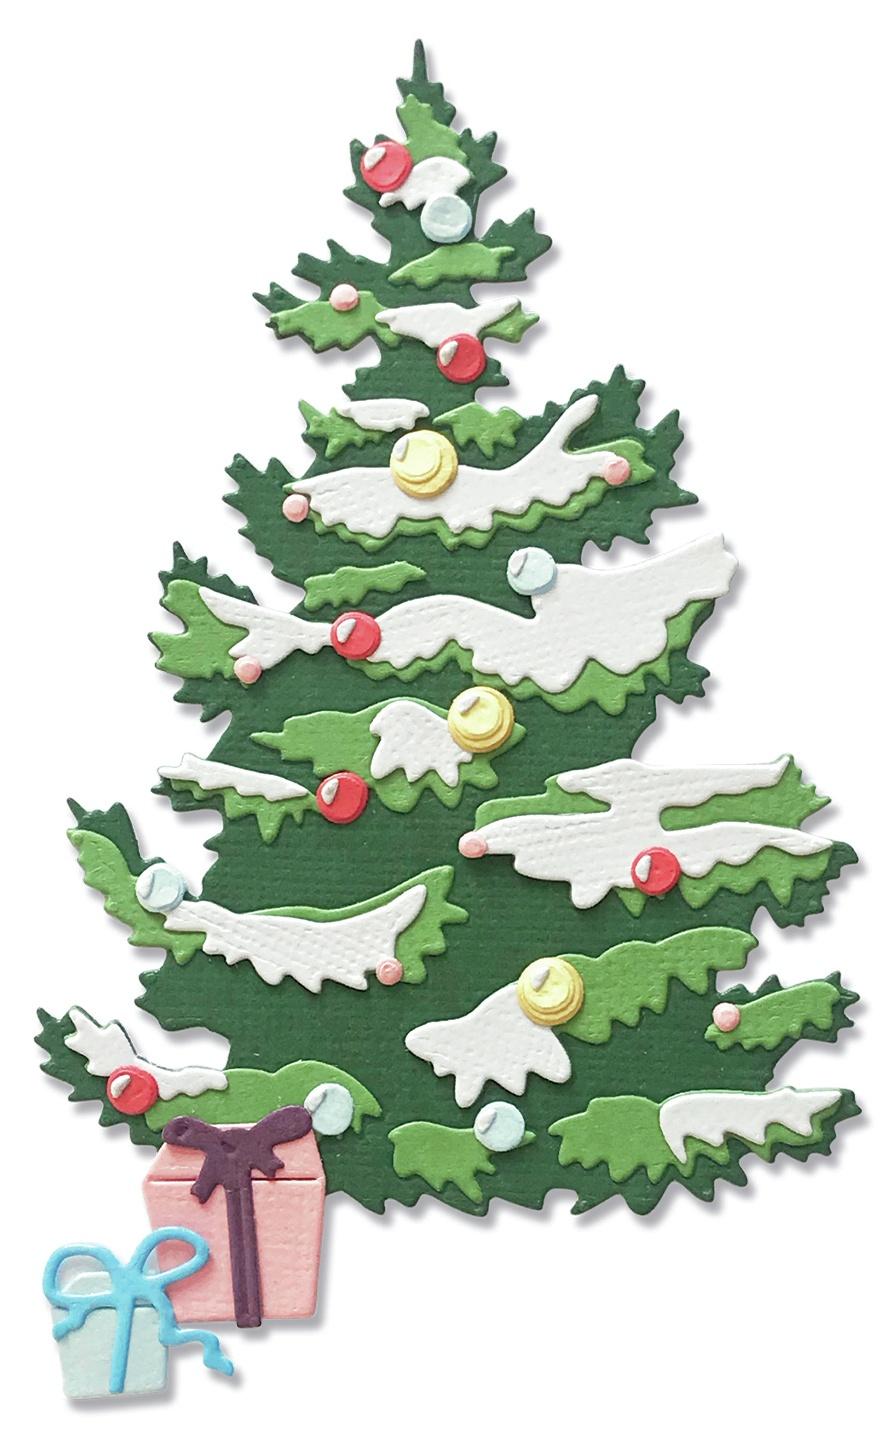 Sizzix - Thinlits Dies - Layered Christmas Tree